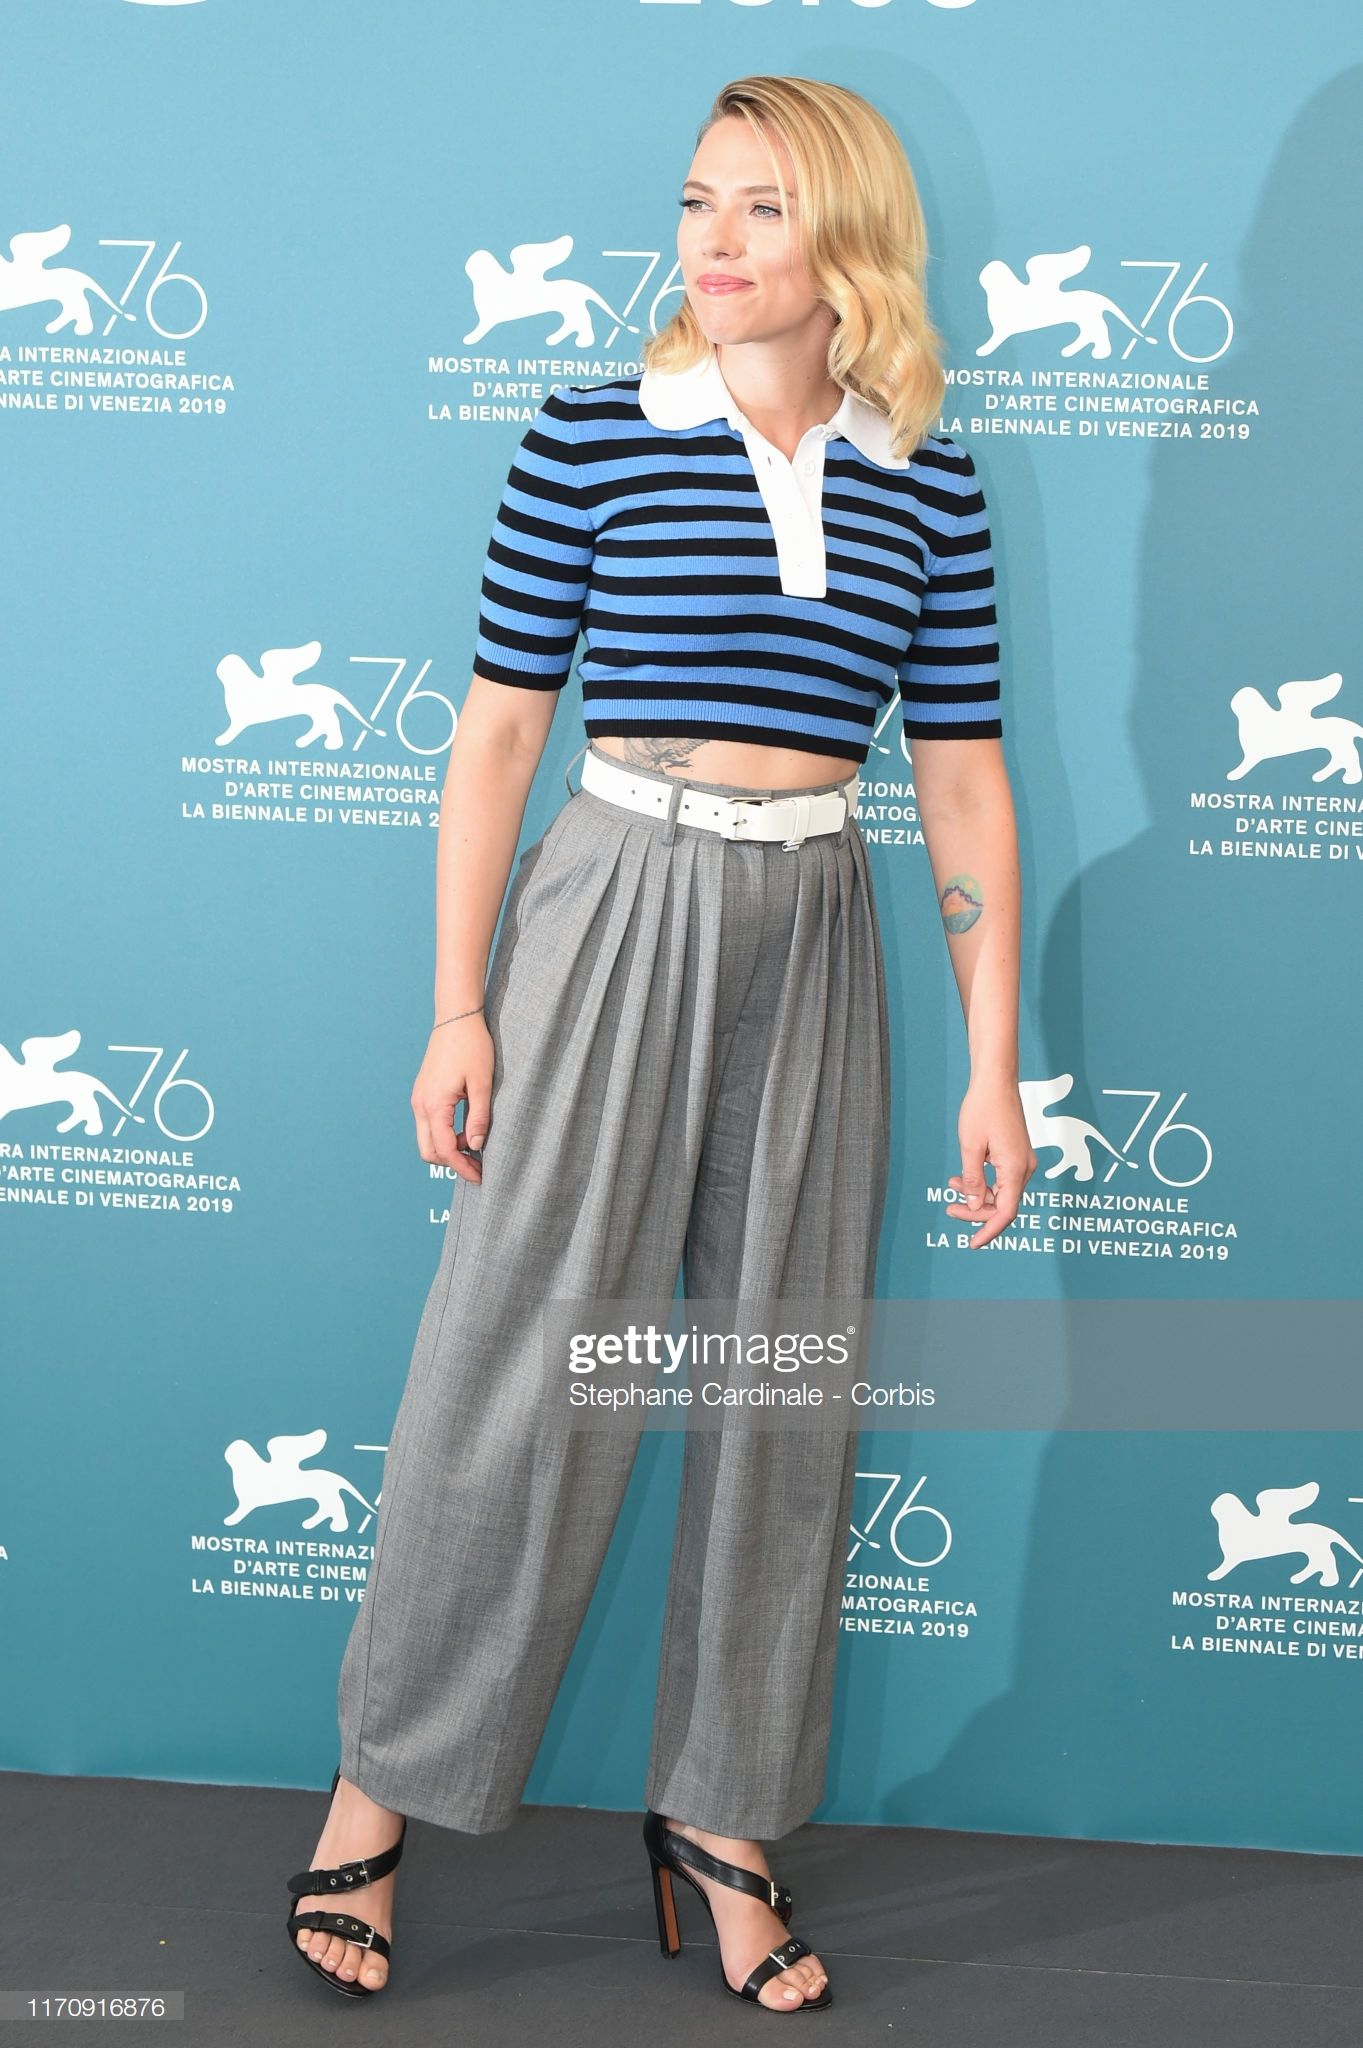 Venice Film Festival 2019 image by Scarlett photoshoots